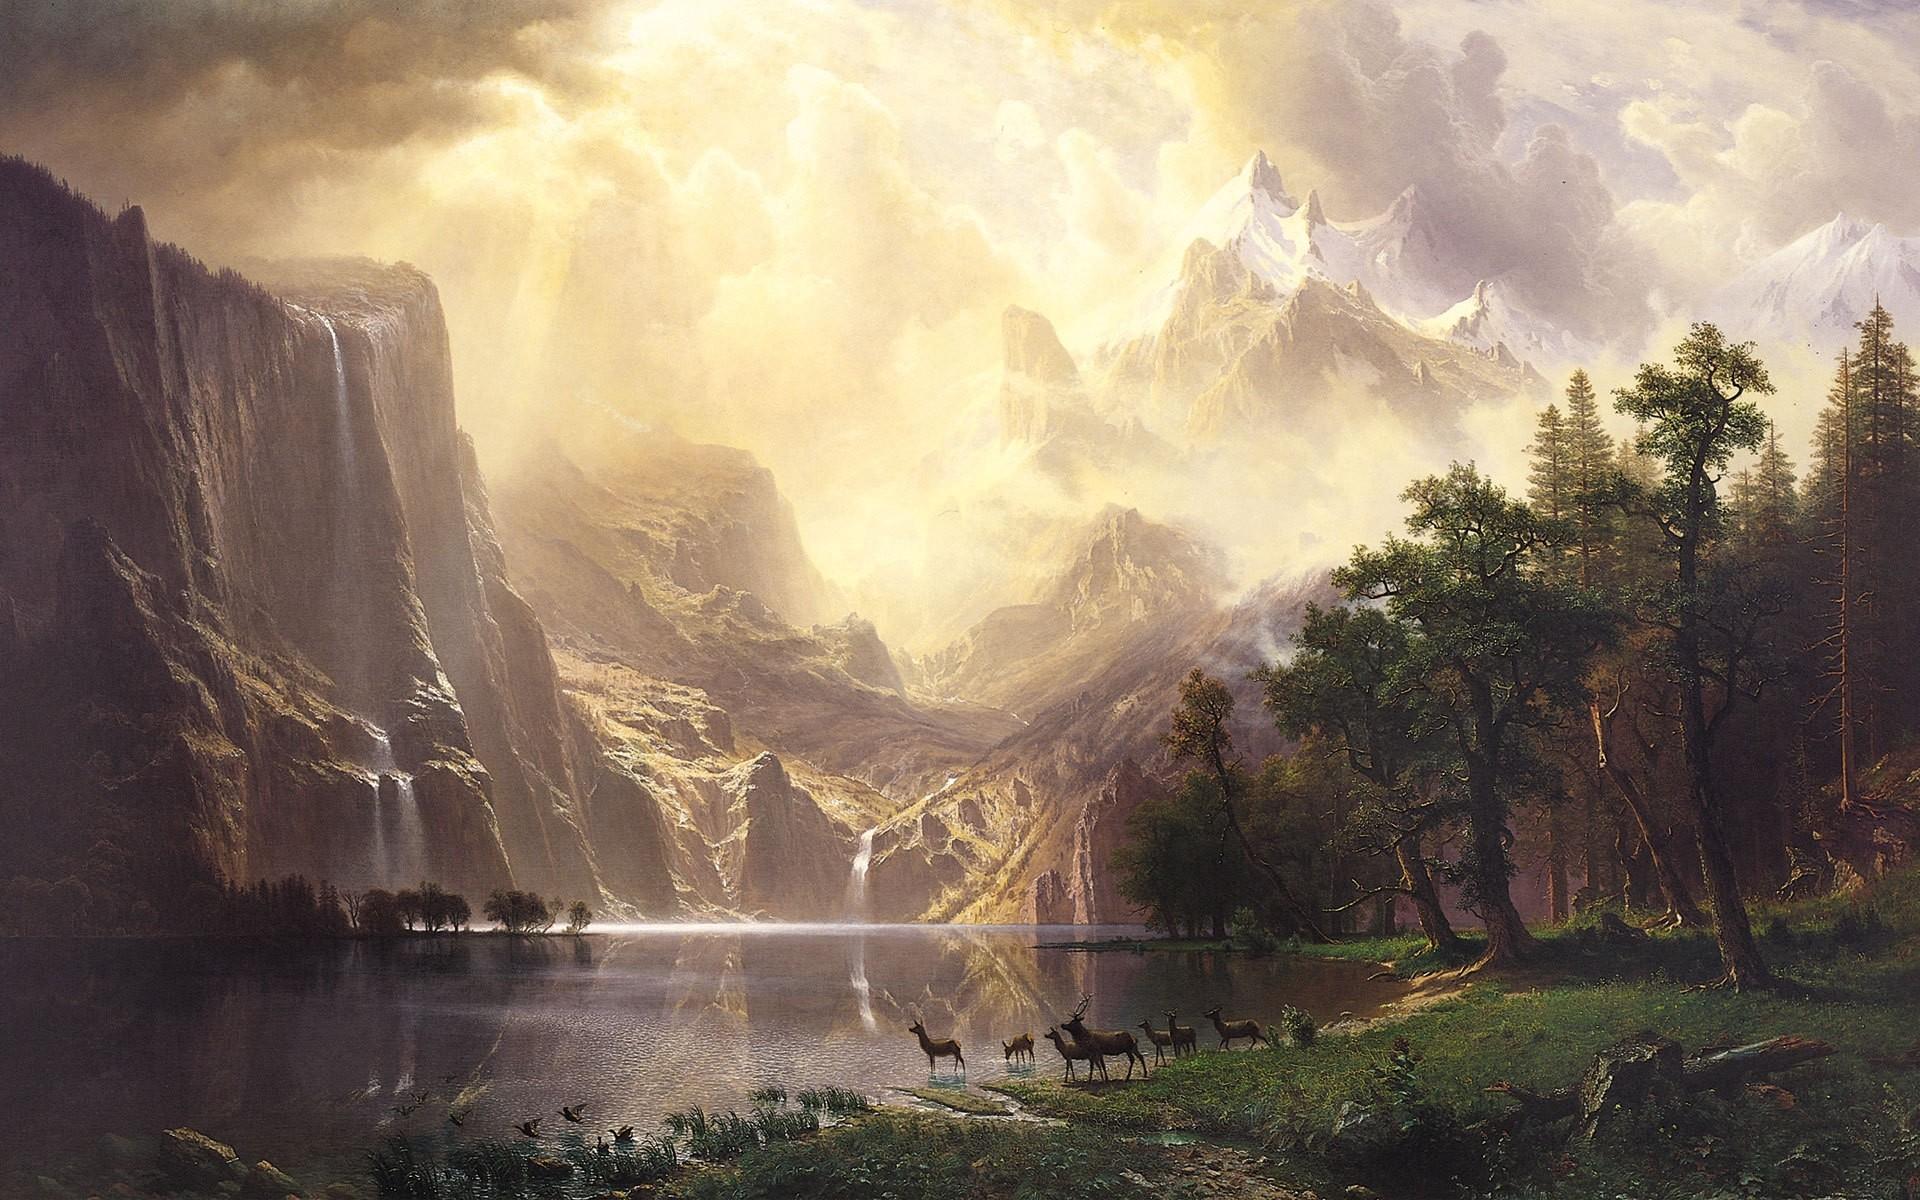 Beautiful Wallpaper Mountain Fantasy - latest?cb\u003d20170711074609  Pic_45430.jpg/revision/latest?cb\u003d20170711074609